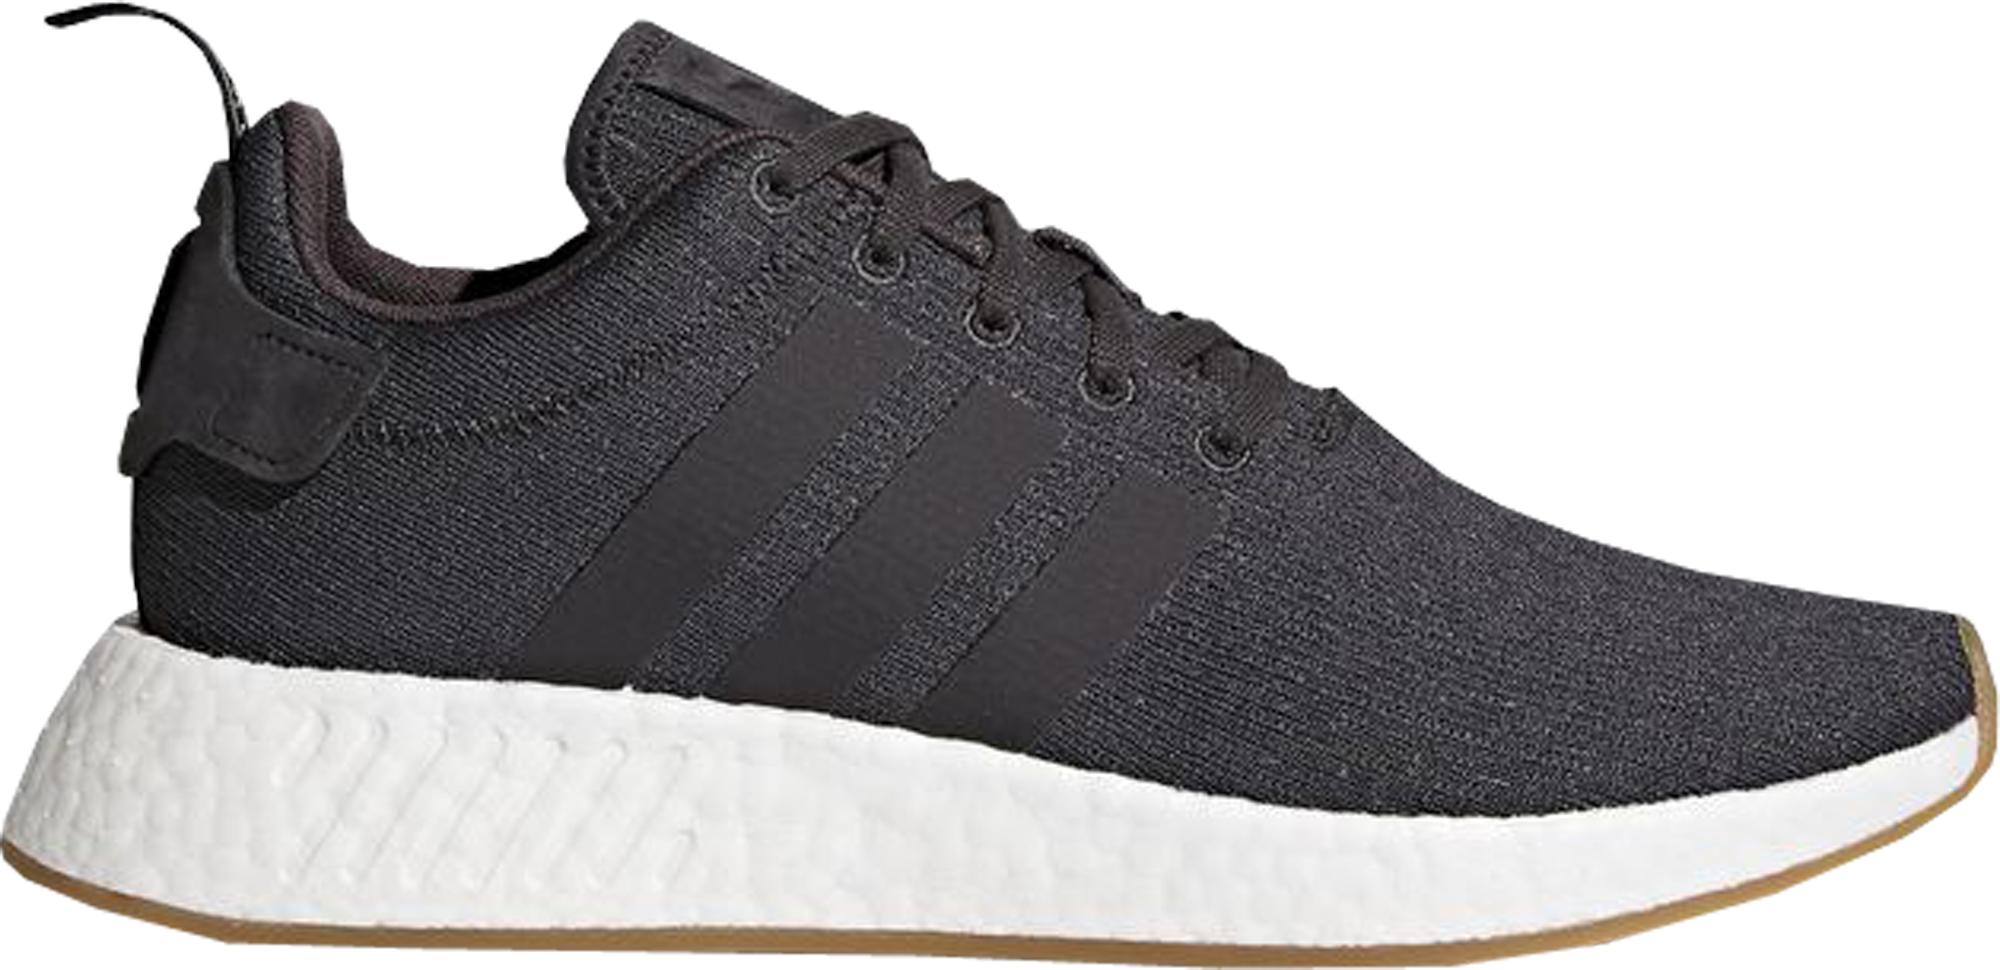 Comprar Adidas NMD talla 14 material zapatos & zapatillas